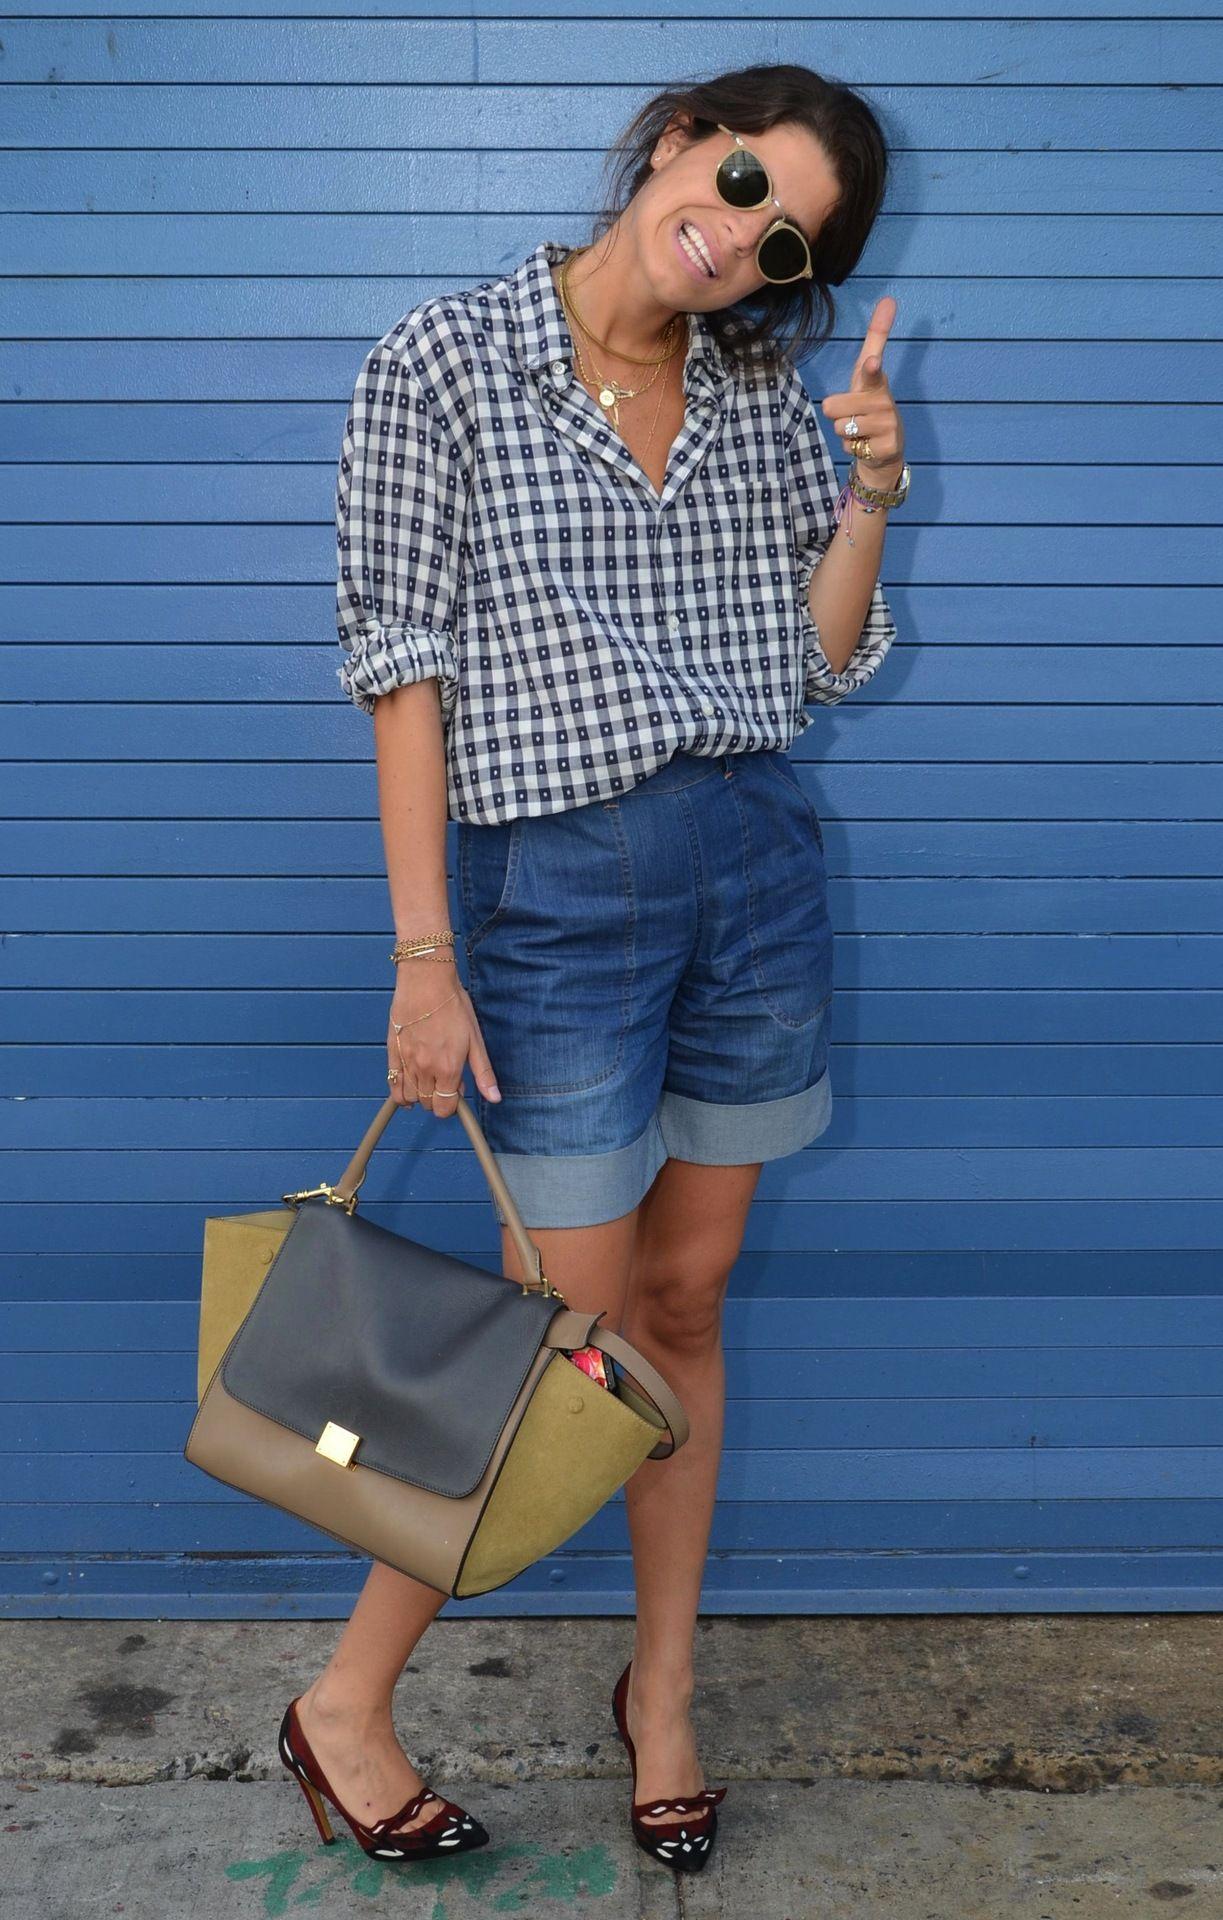 The Man Repeller herself! #manrepeller #blogger #celine #rachelcomey #streetstyle #fashionweek #nyfw